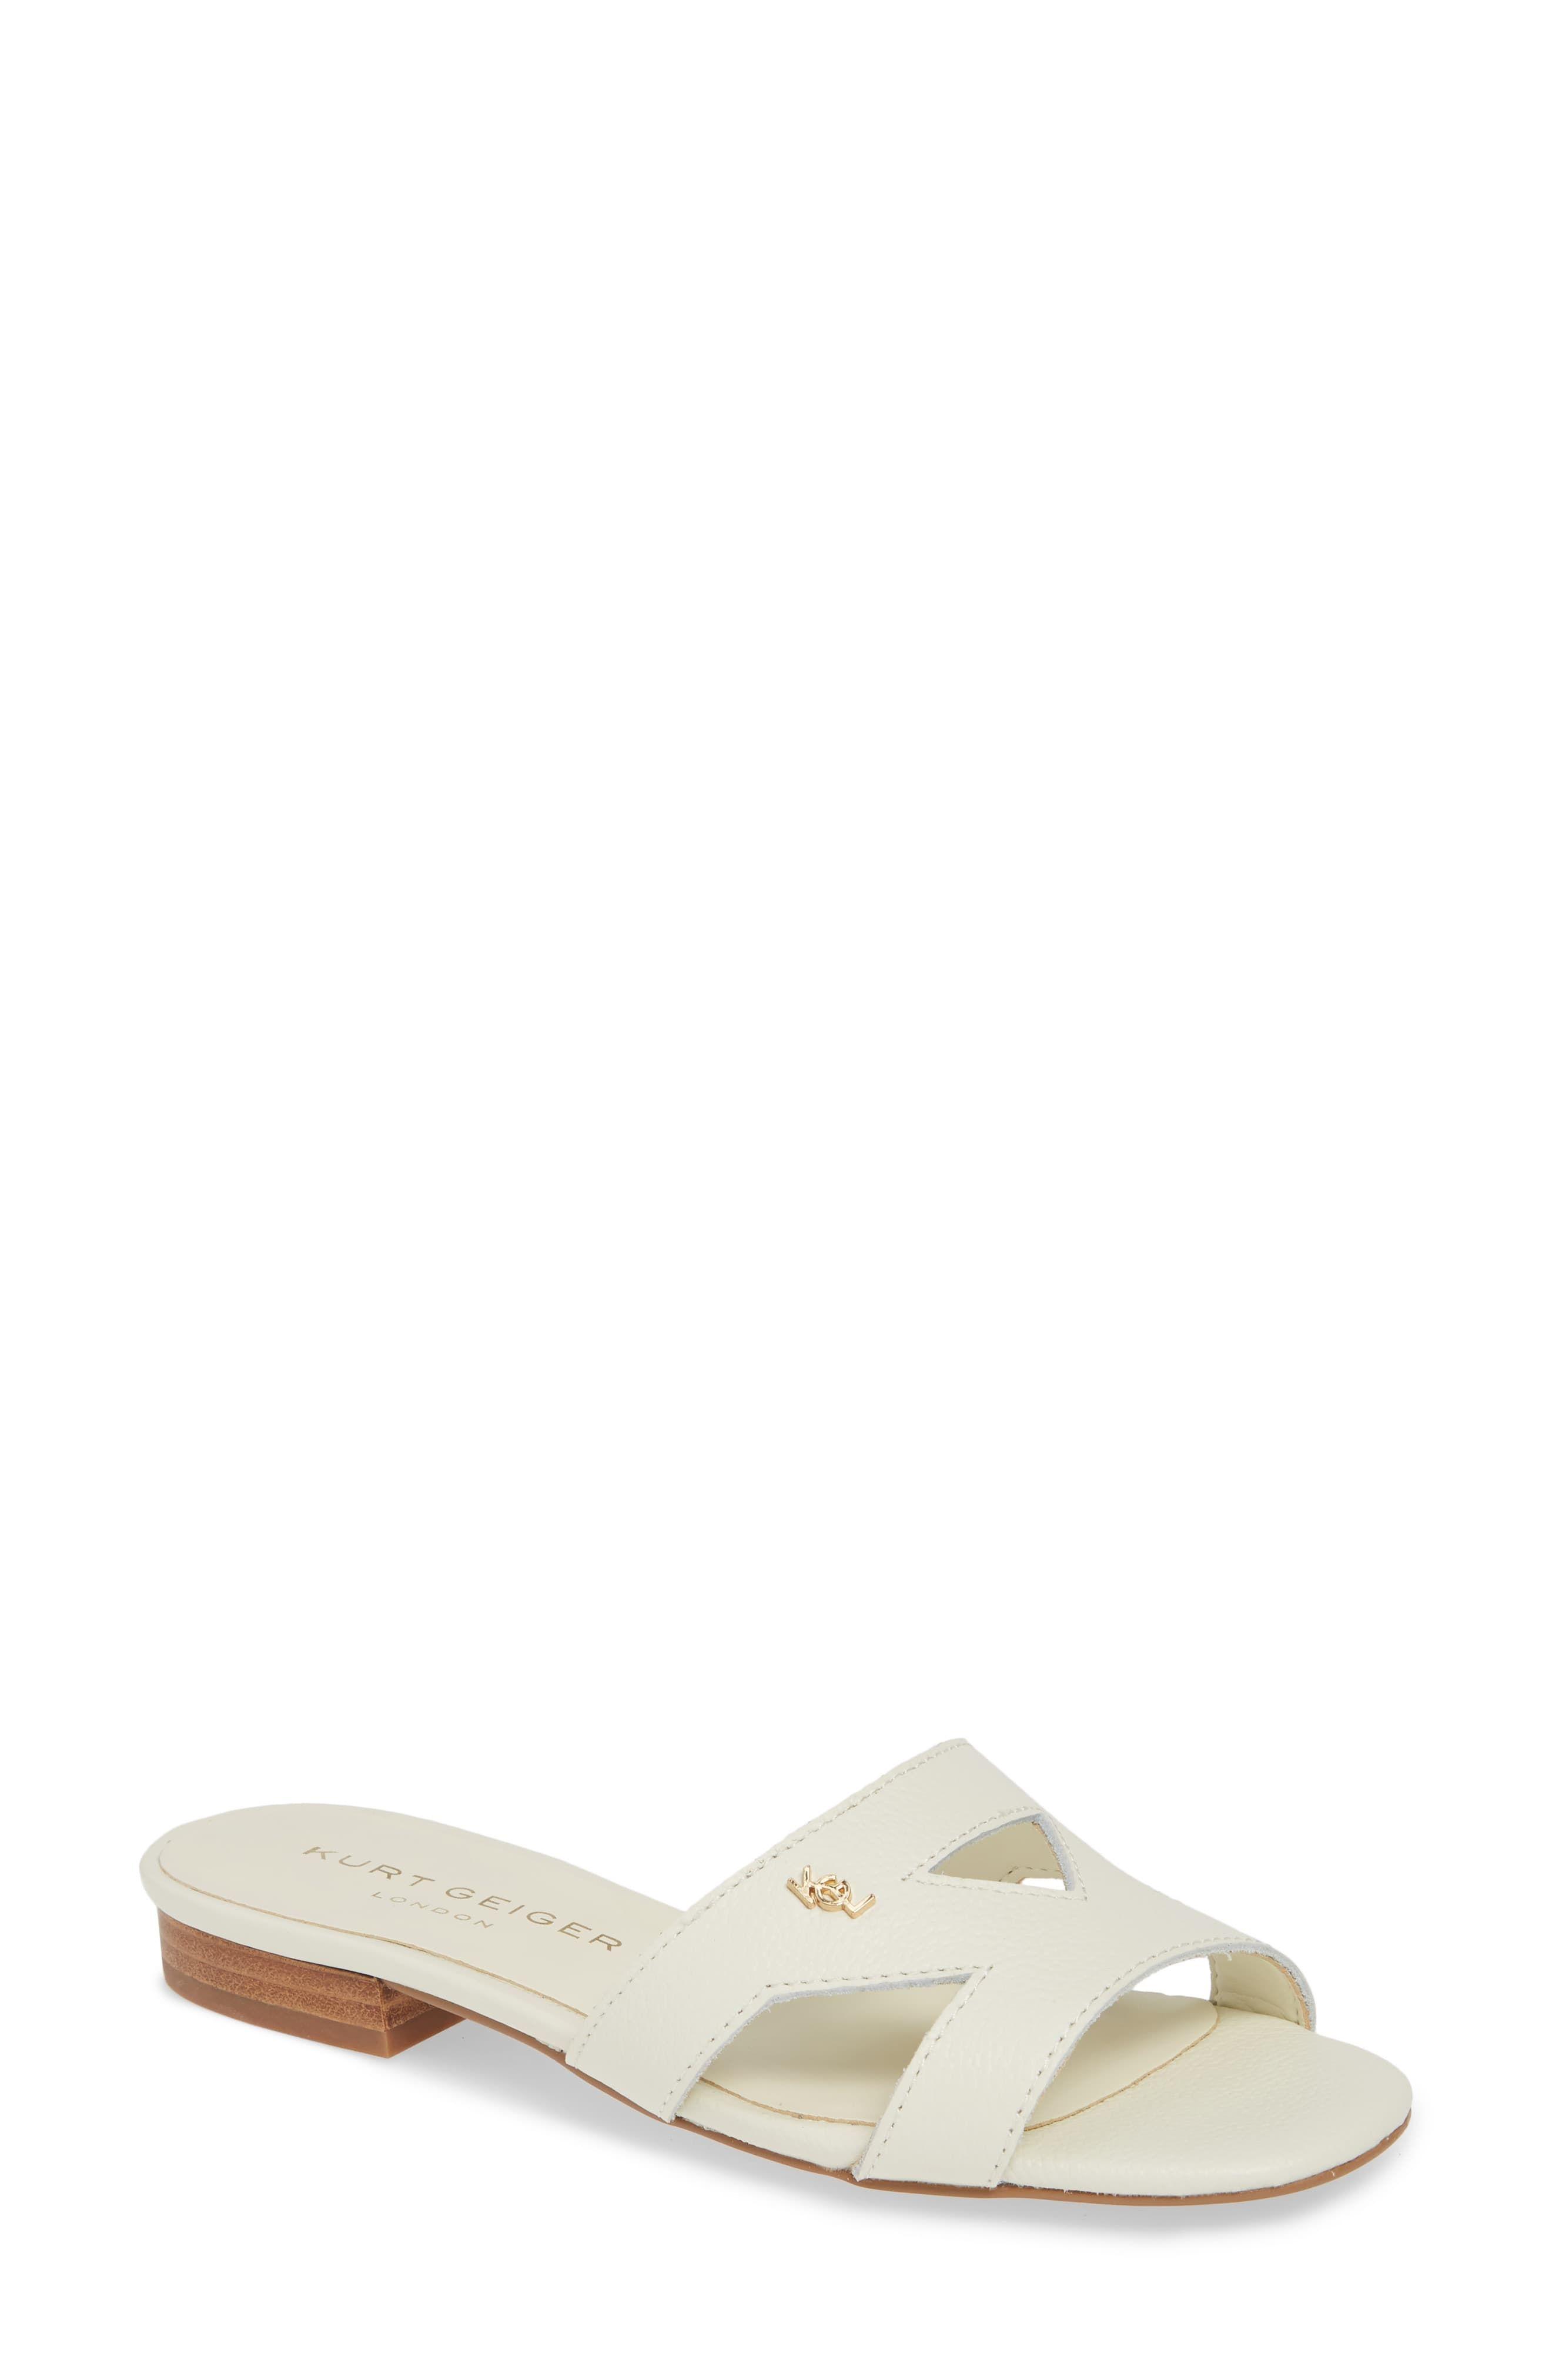 56bab909faf Women's Kurt Geiger London Odina Cutout Slide Sandal, Size 10 M ...